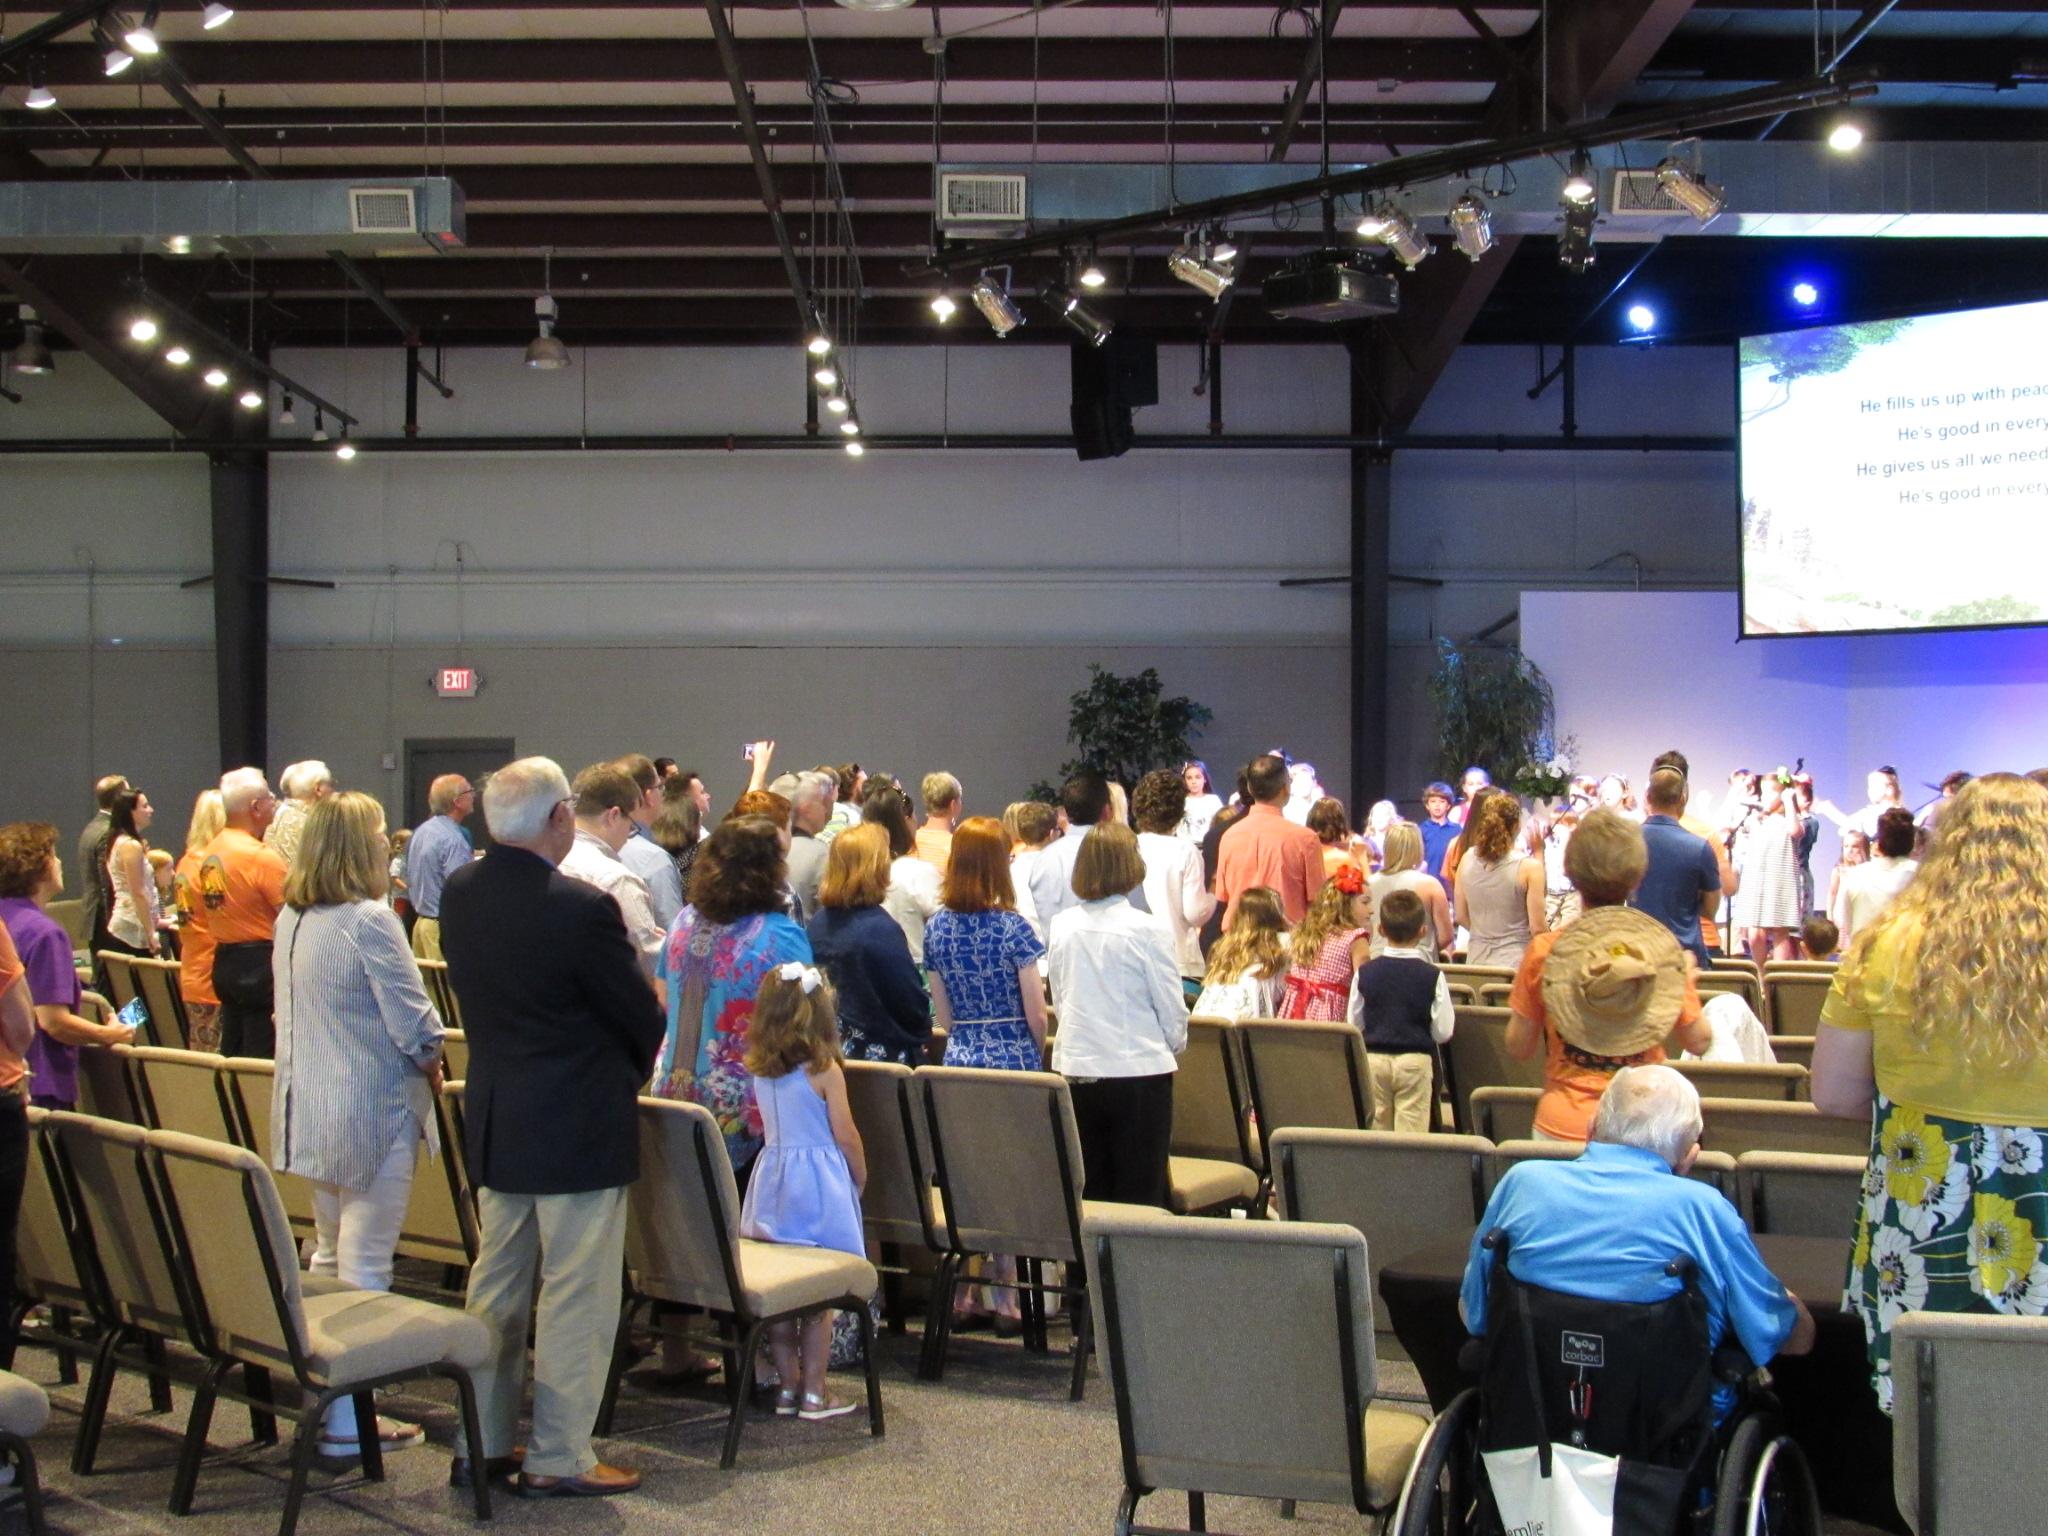 VBS kids lead the church in worship